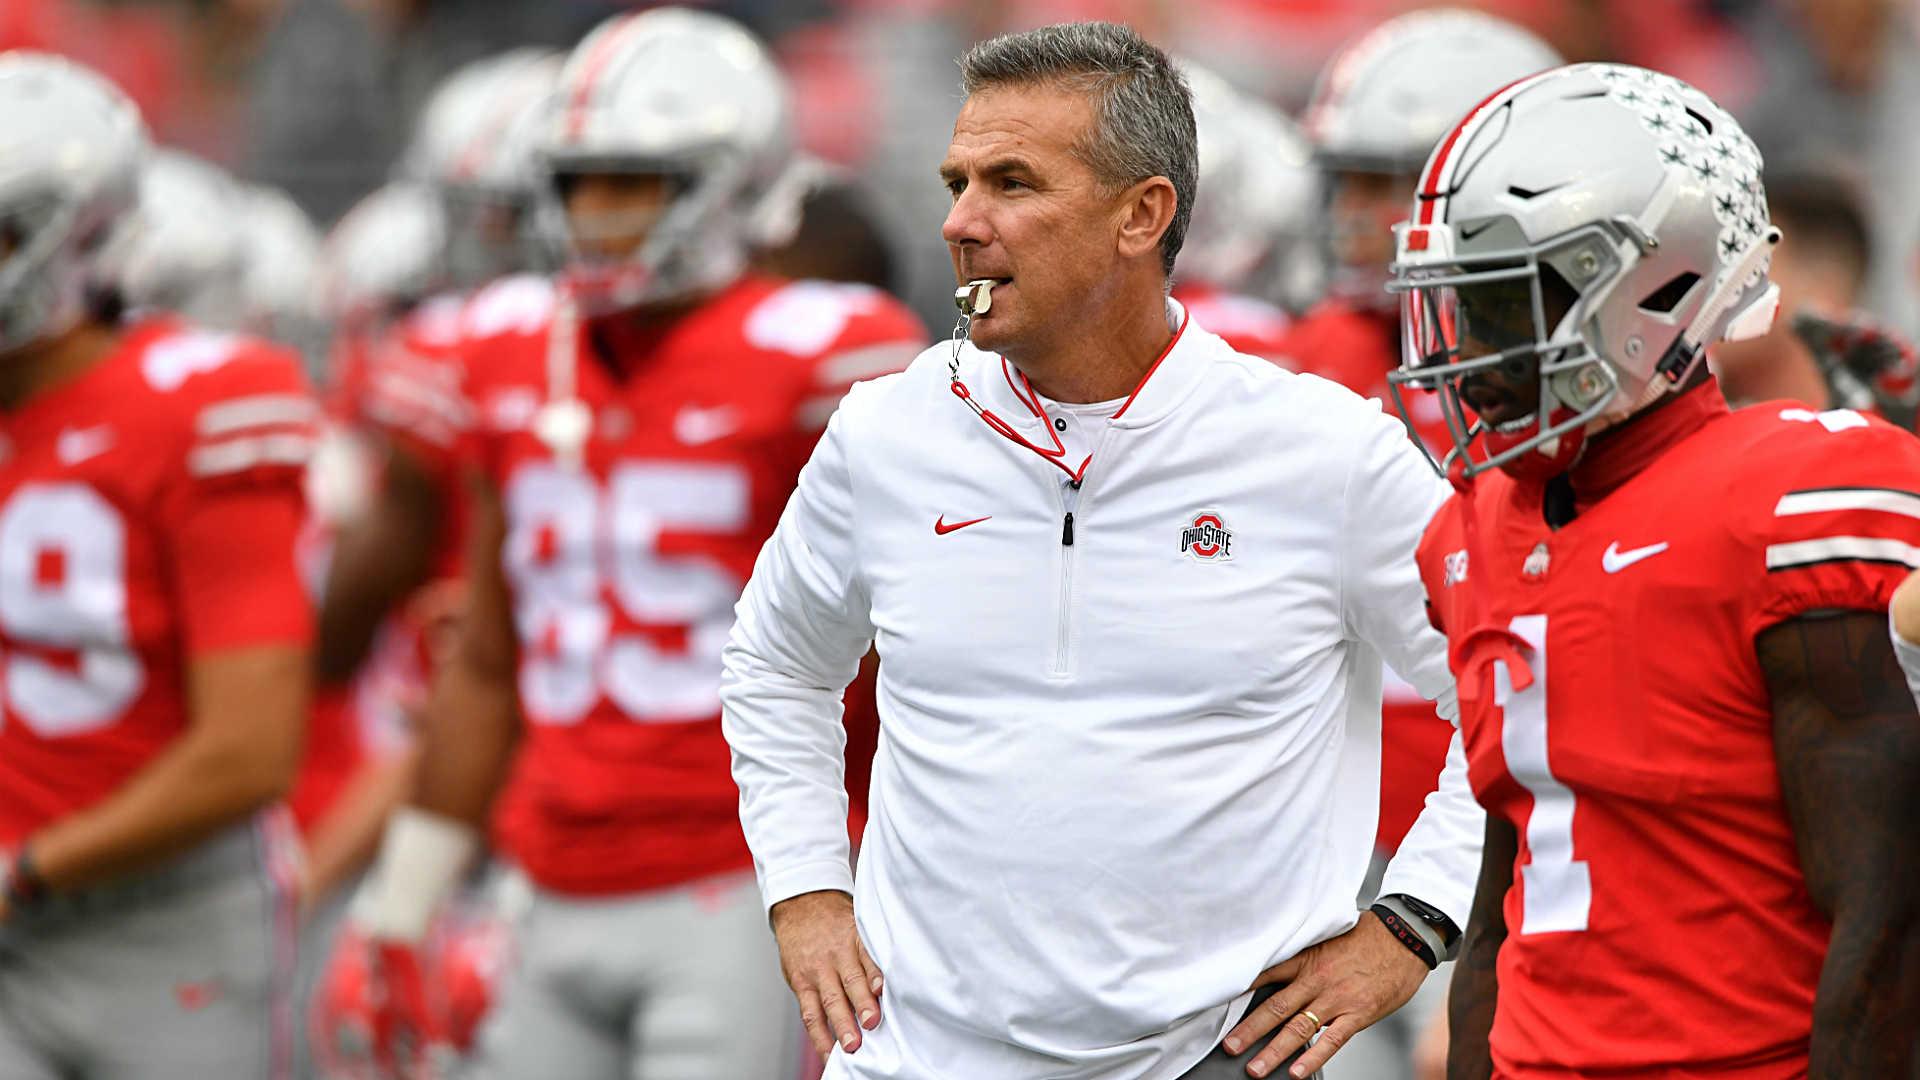 Urban Meyer Ftr Ohio State Coach Announces Retirement